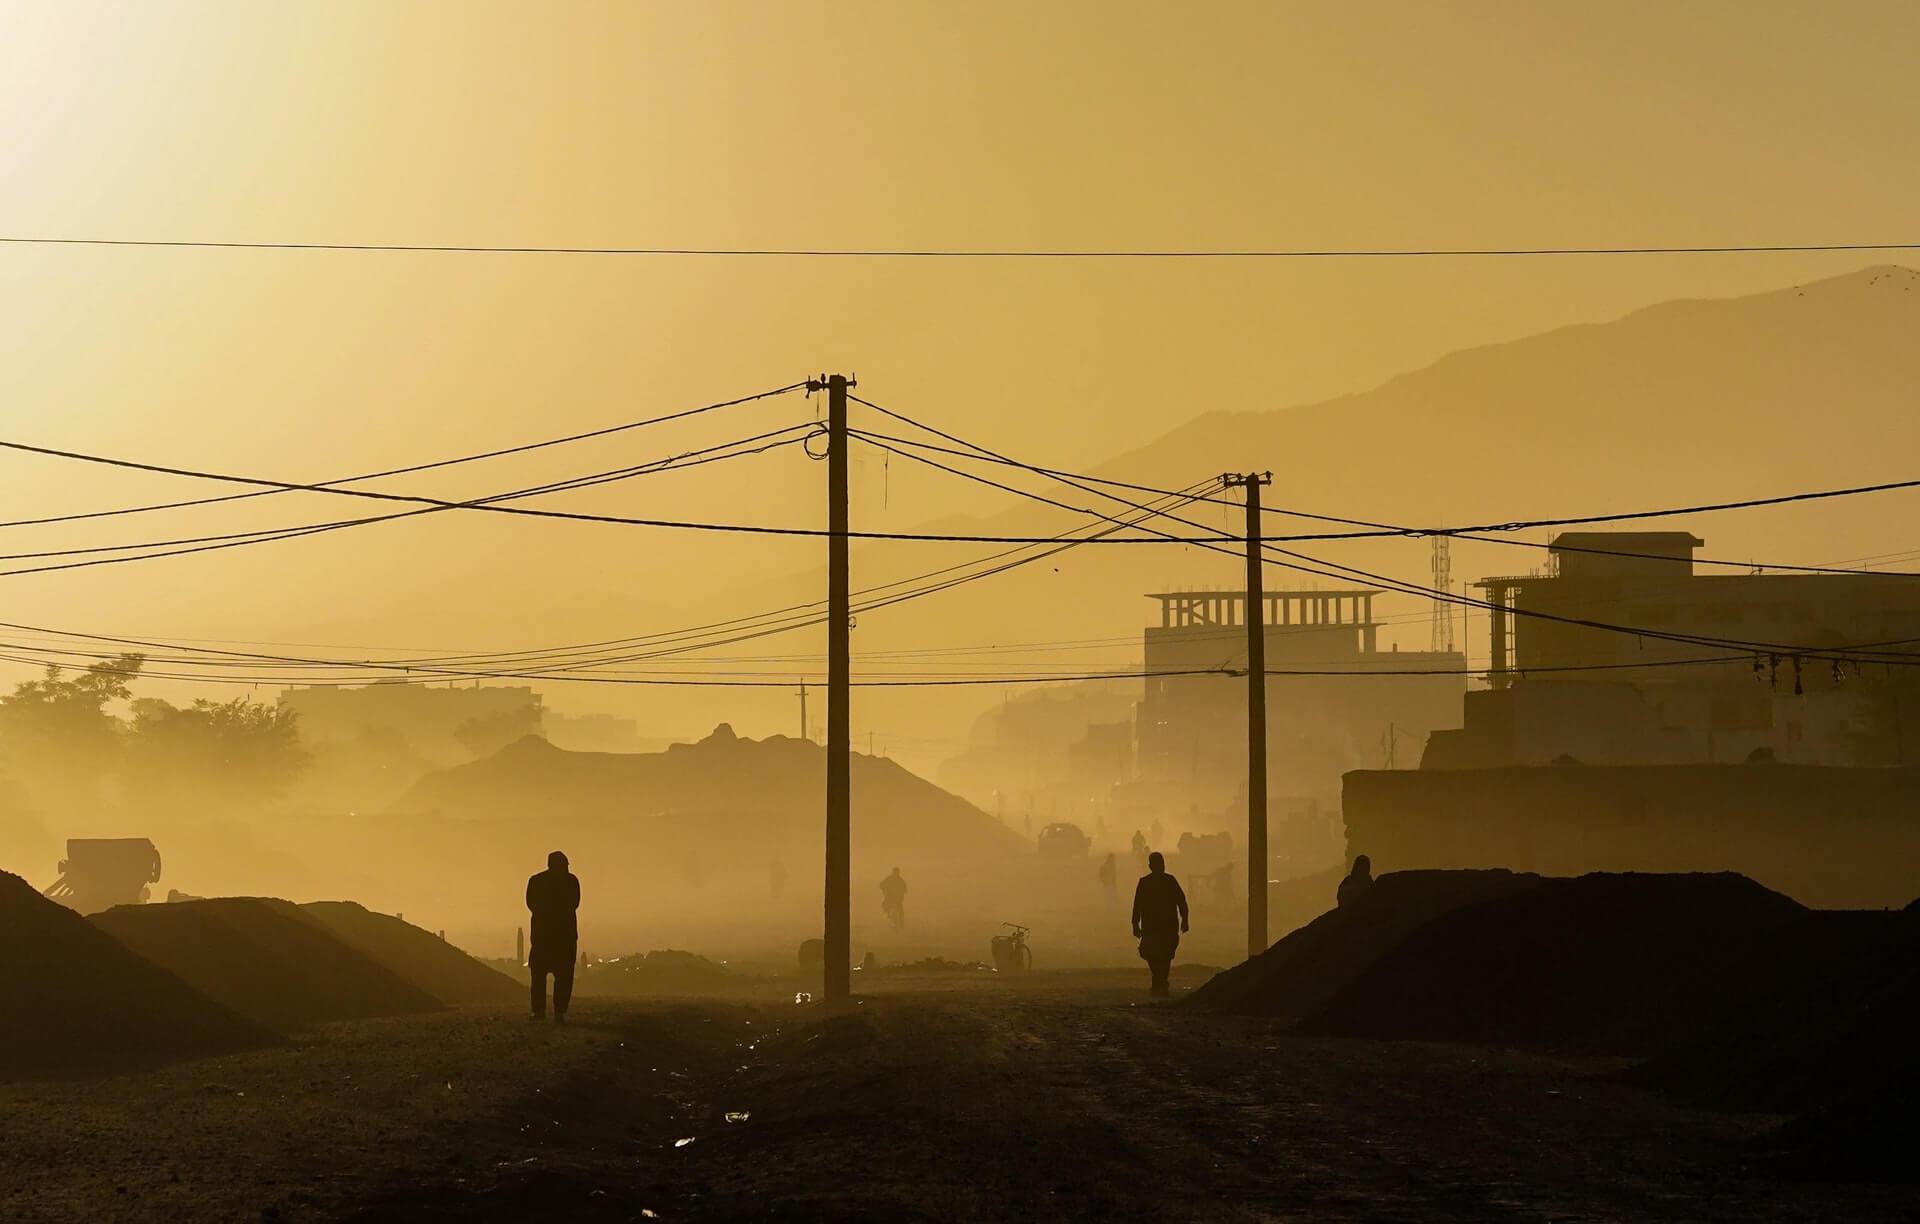 Locals walk down a dusty, desolate street in Kabul at sunrise.